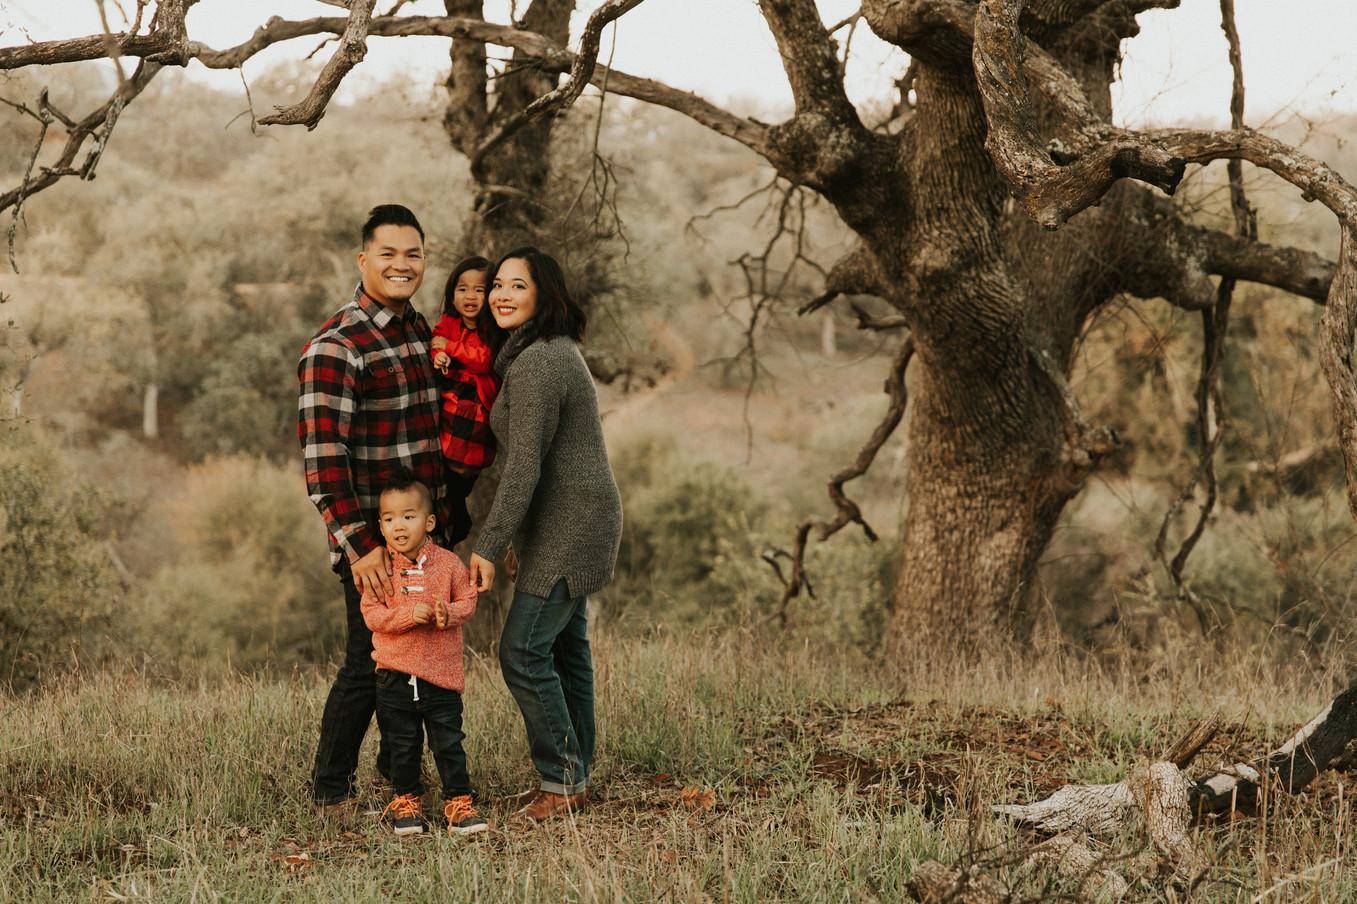 tranfamily-2897.jpg